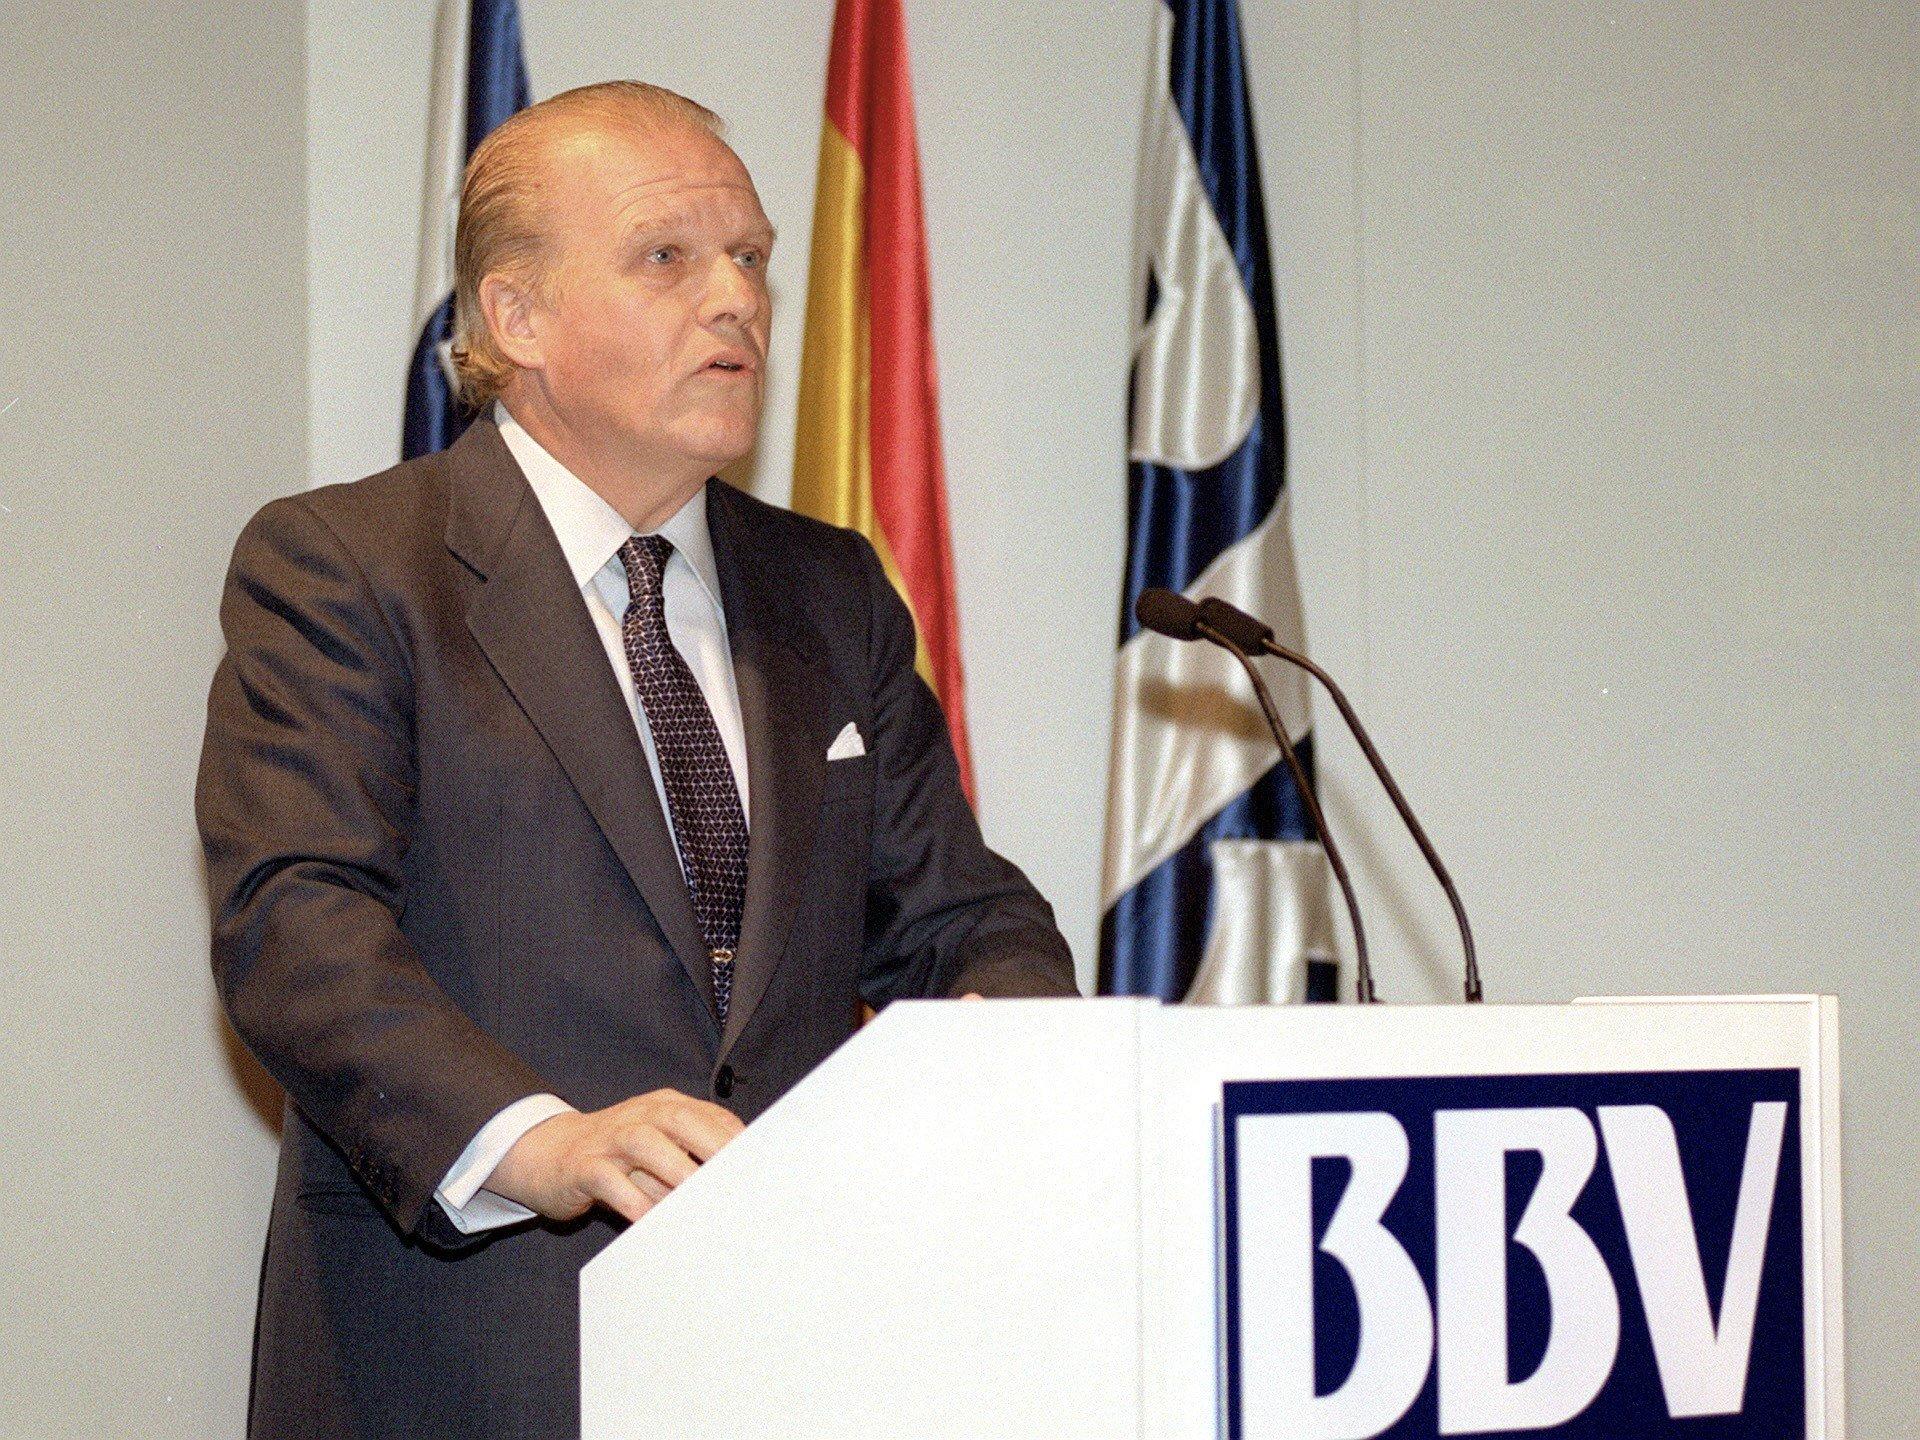 Emilio Ybarra EFE